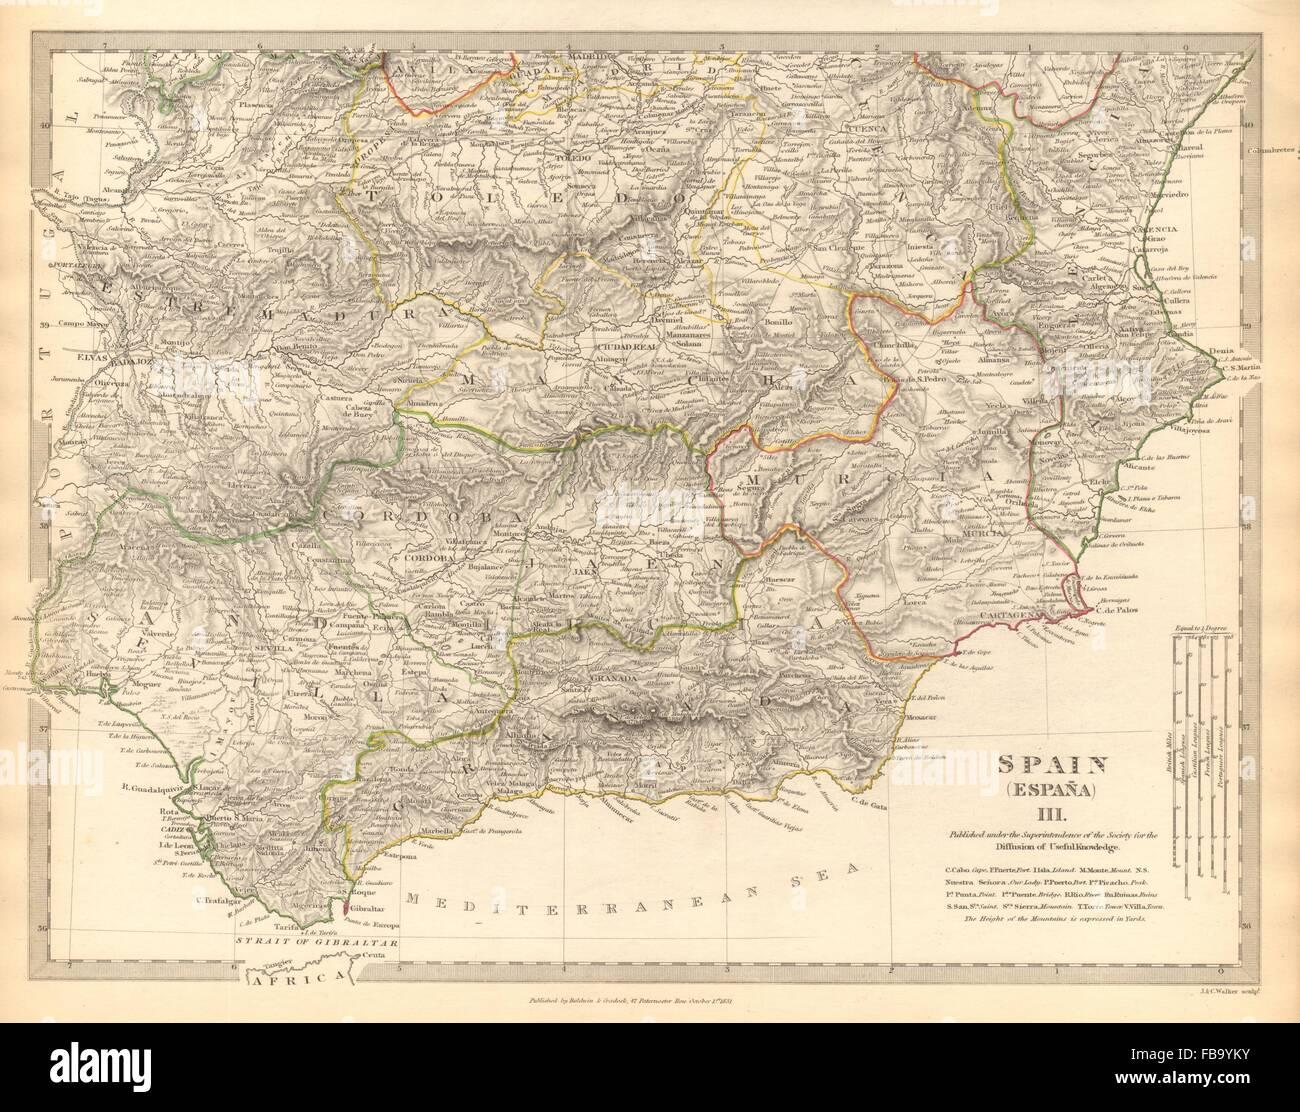 Valencia Spain Map Stockfotos & Valencia Spain Map Bilder ...